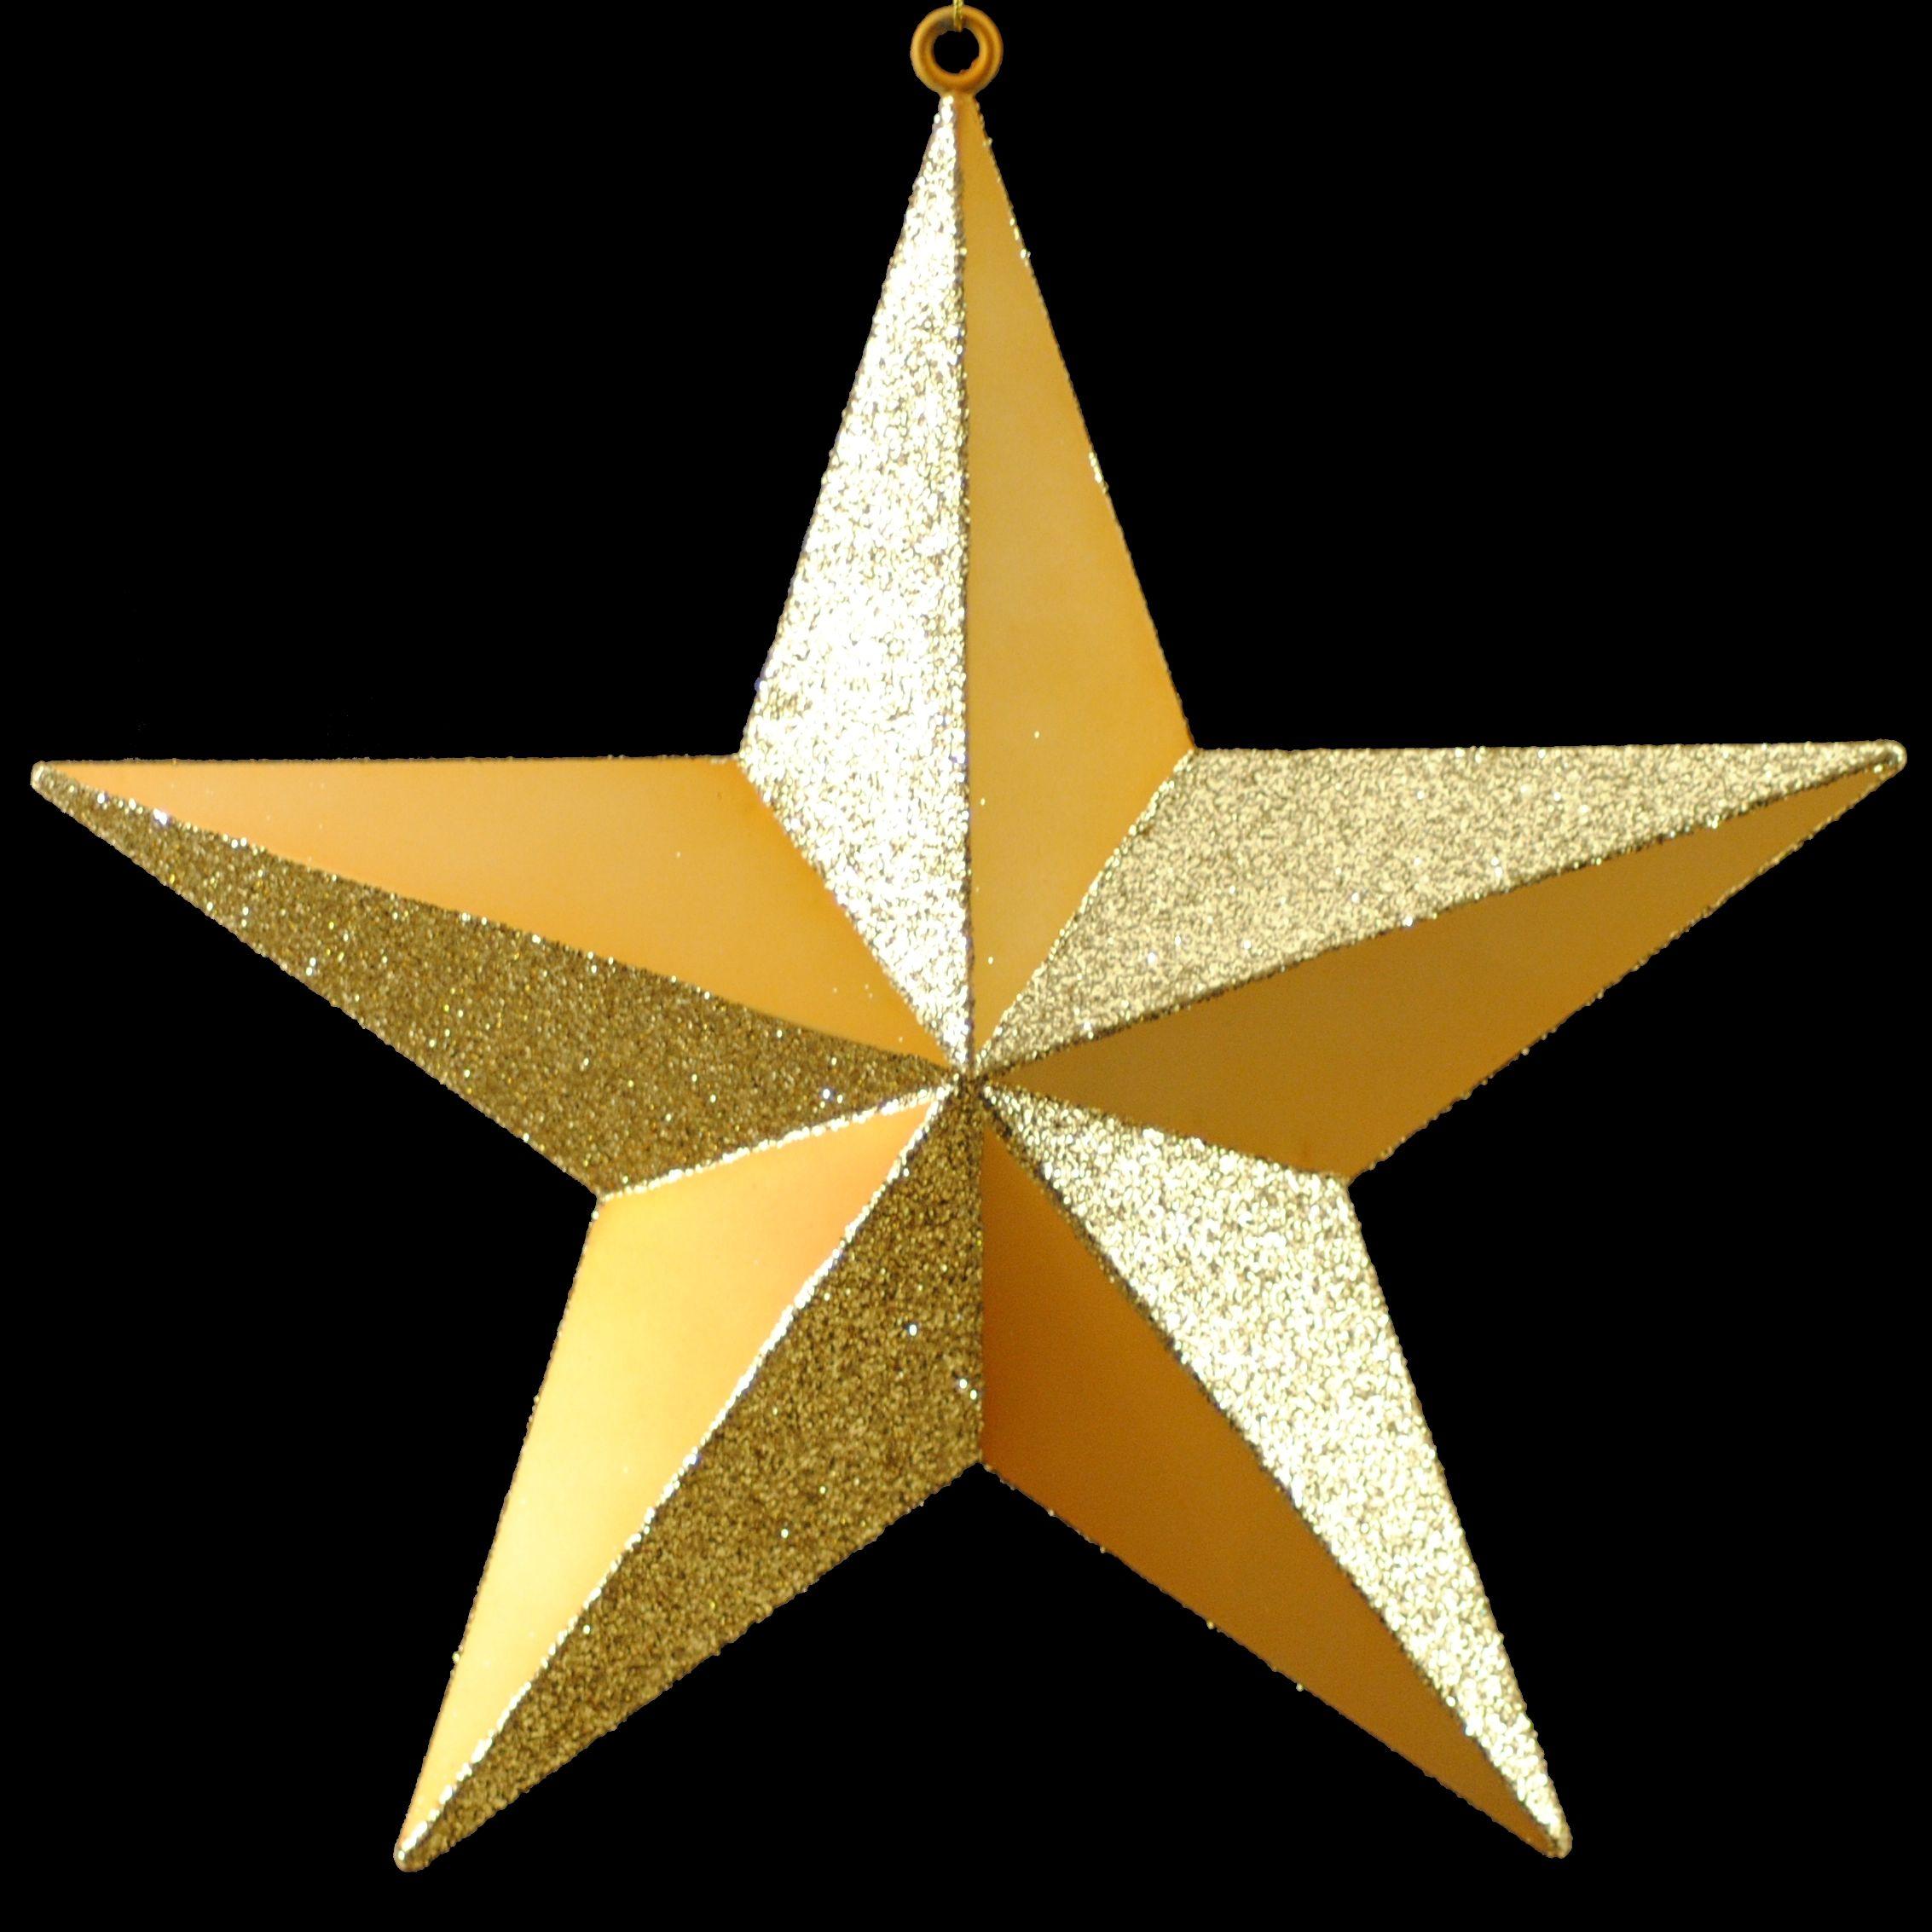 Big Gold Star Bing Images